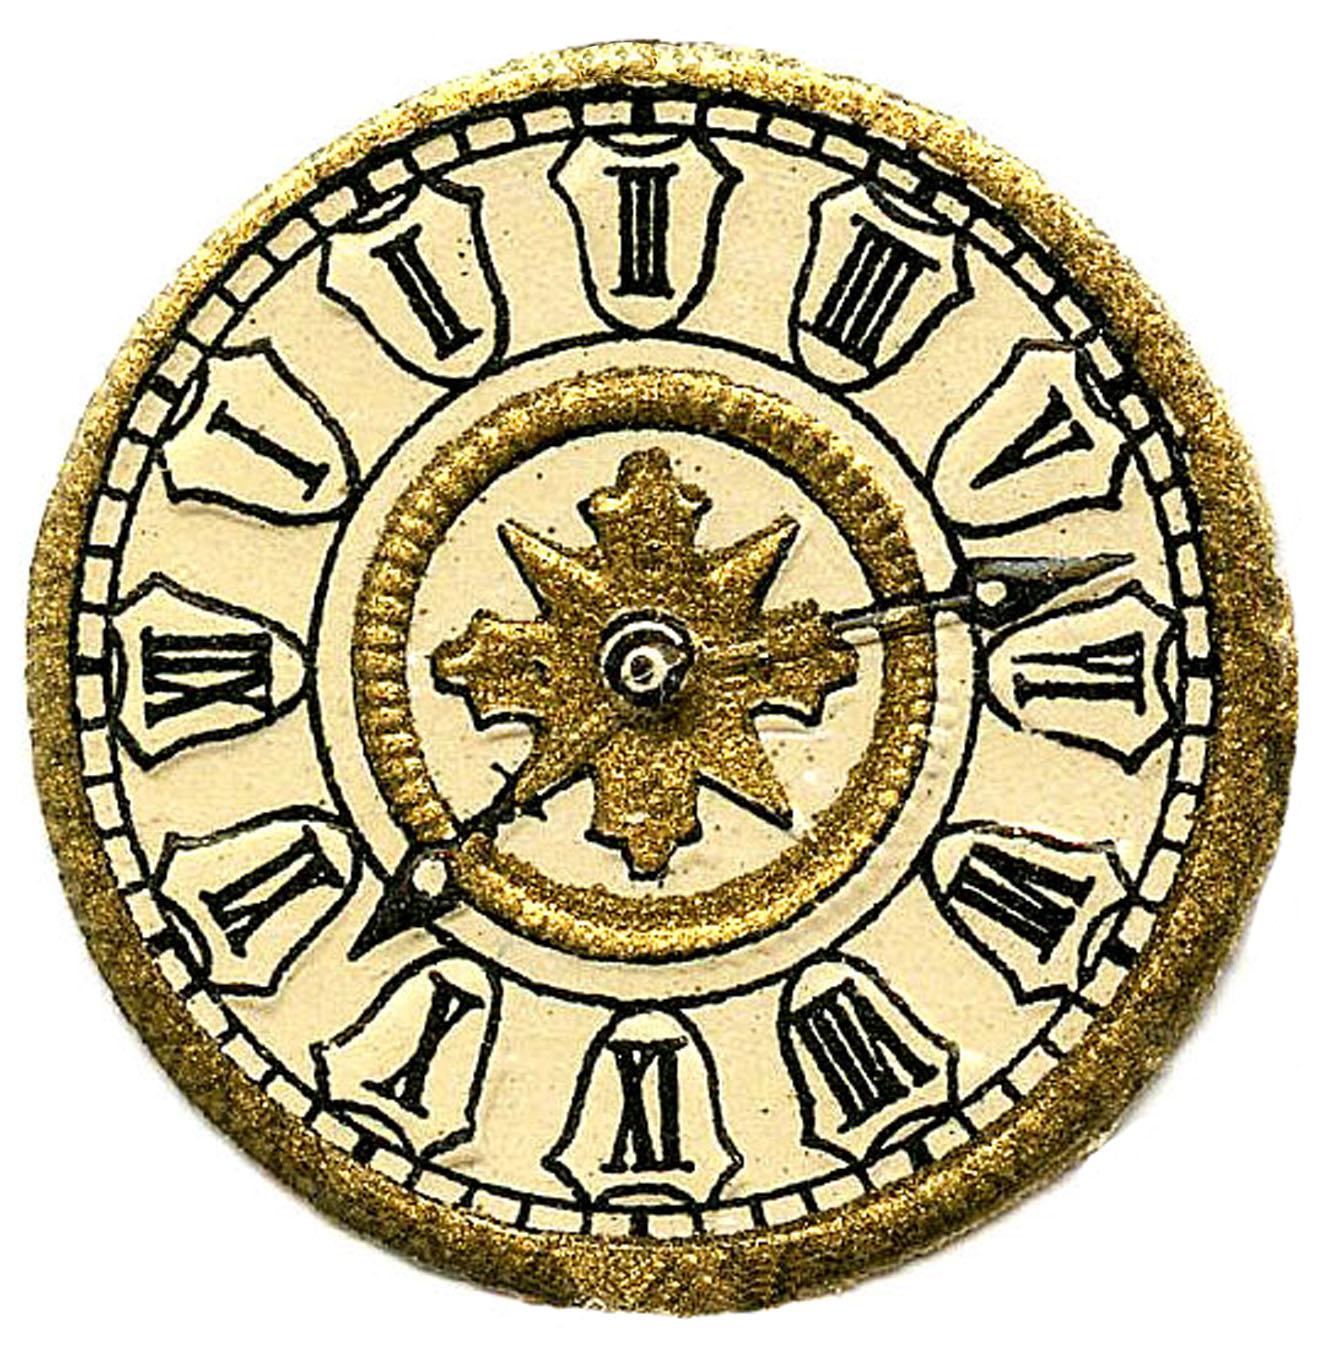 Vintage Clip Art - Scrap Clock Faces - Steampunk - The ...